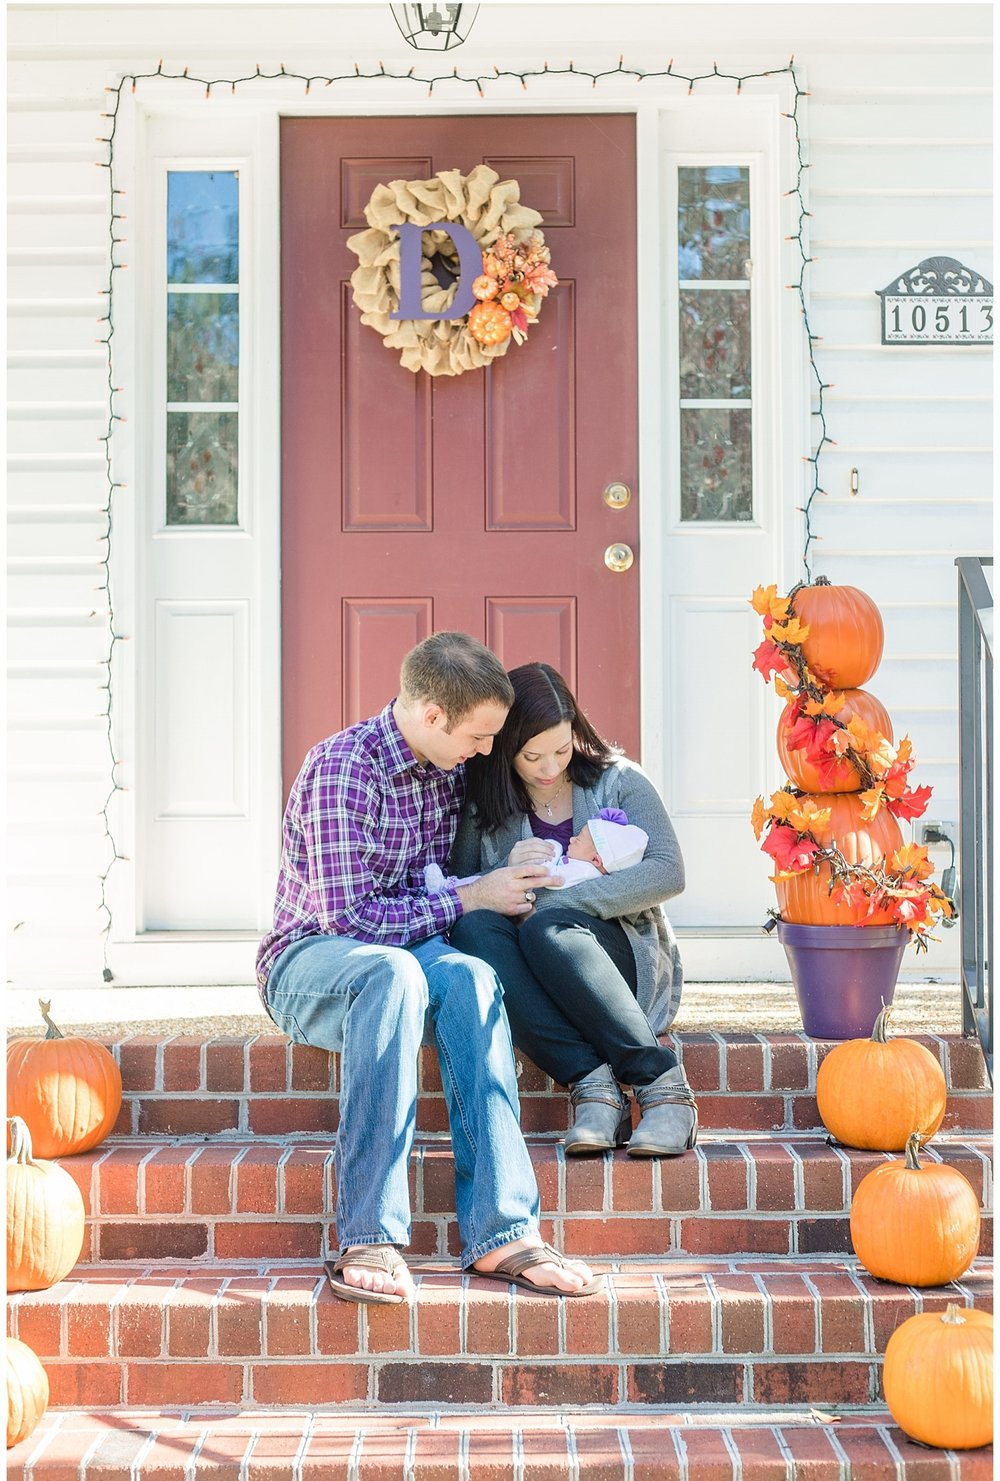 Virginia Fine Art Family Photography - Newborn Baby in Pumpkin